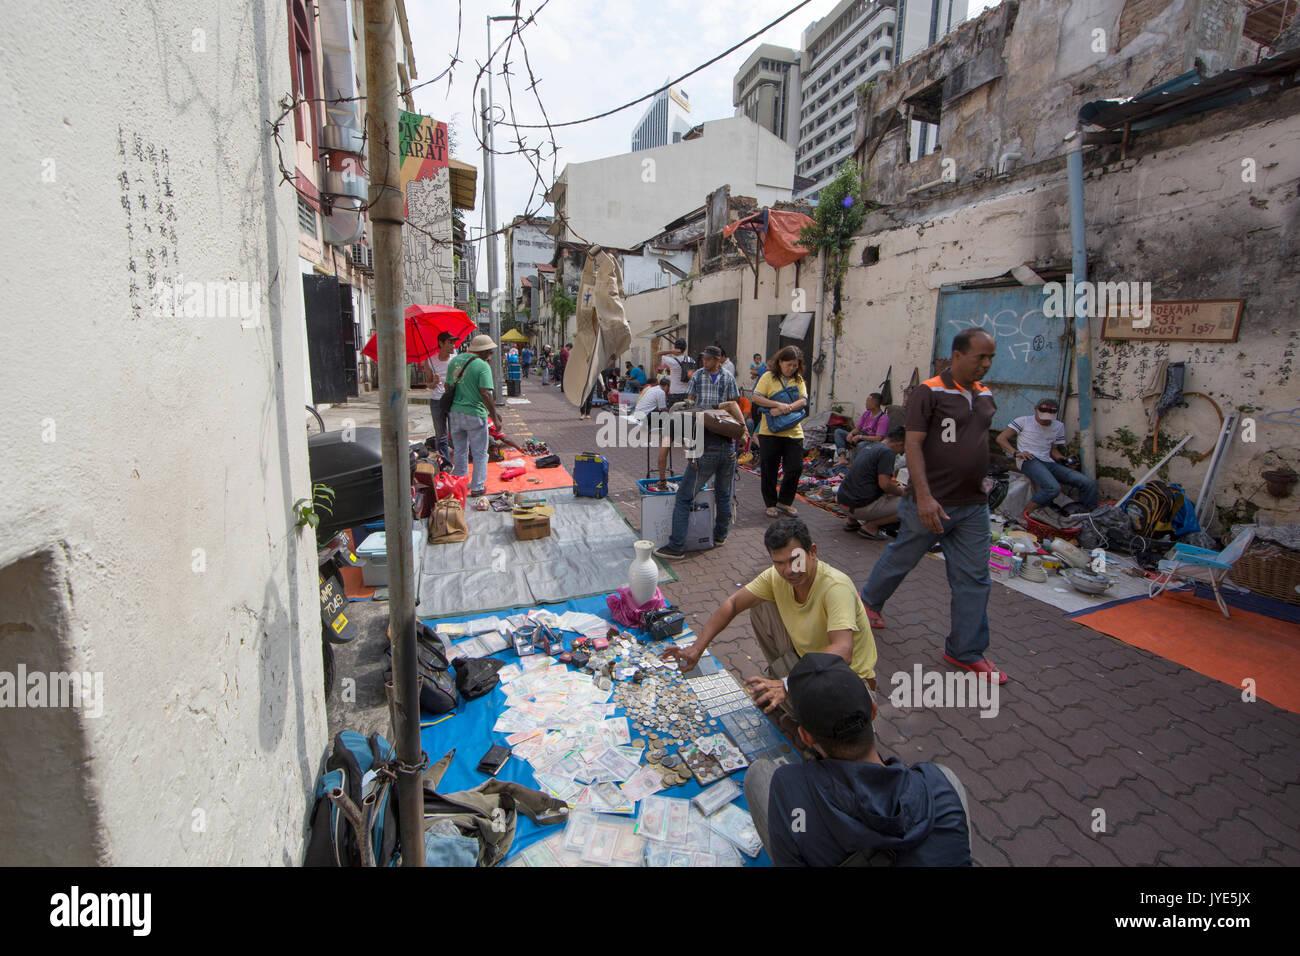 Used items street market in Chinatown, Kuala Lumpur - Stock Image